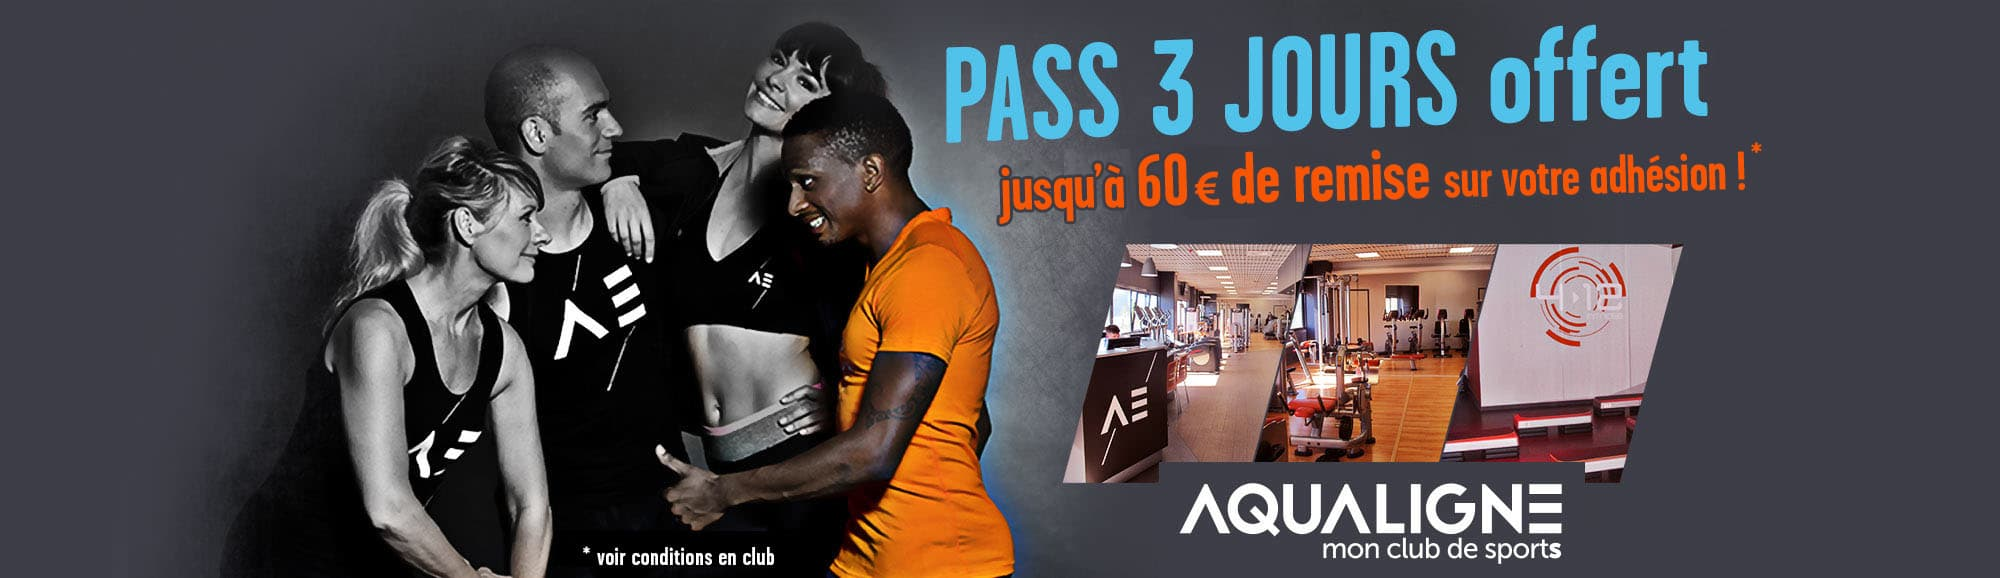 pass3jours-aqualignejpg